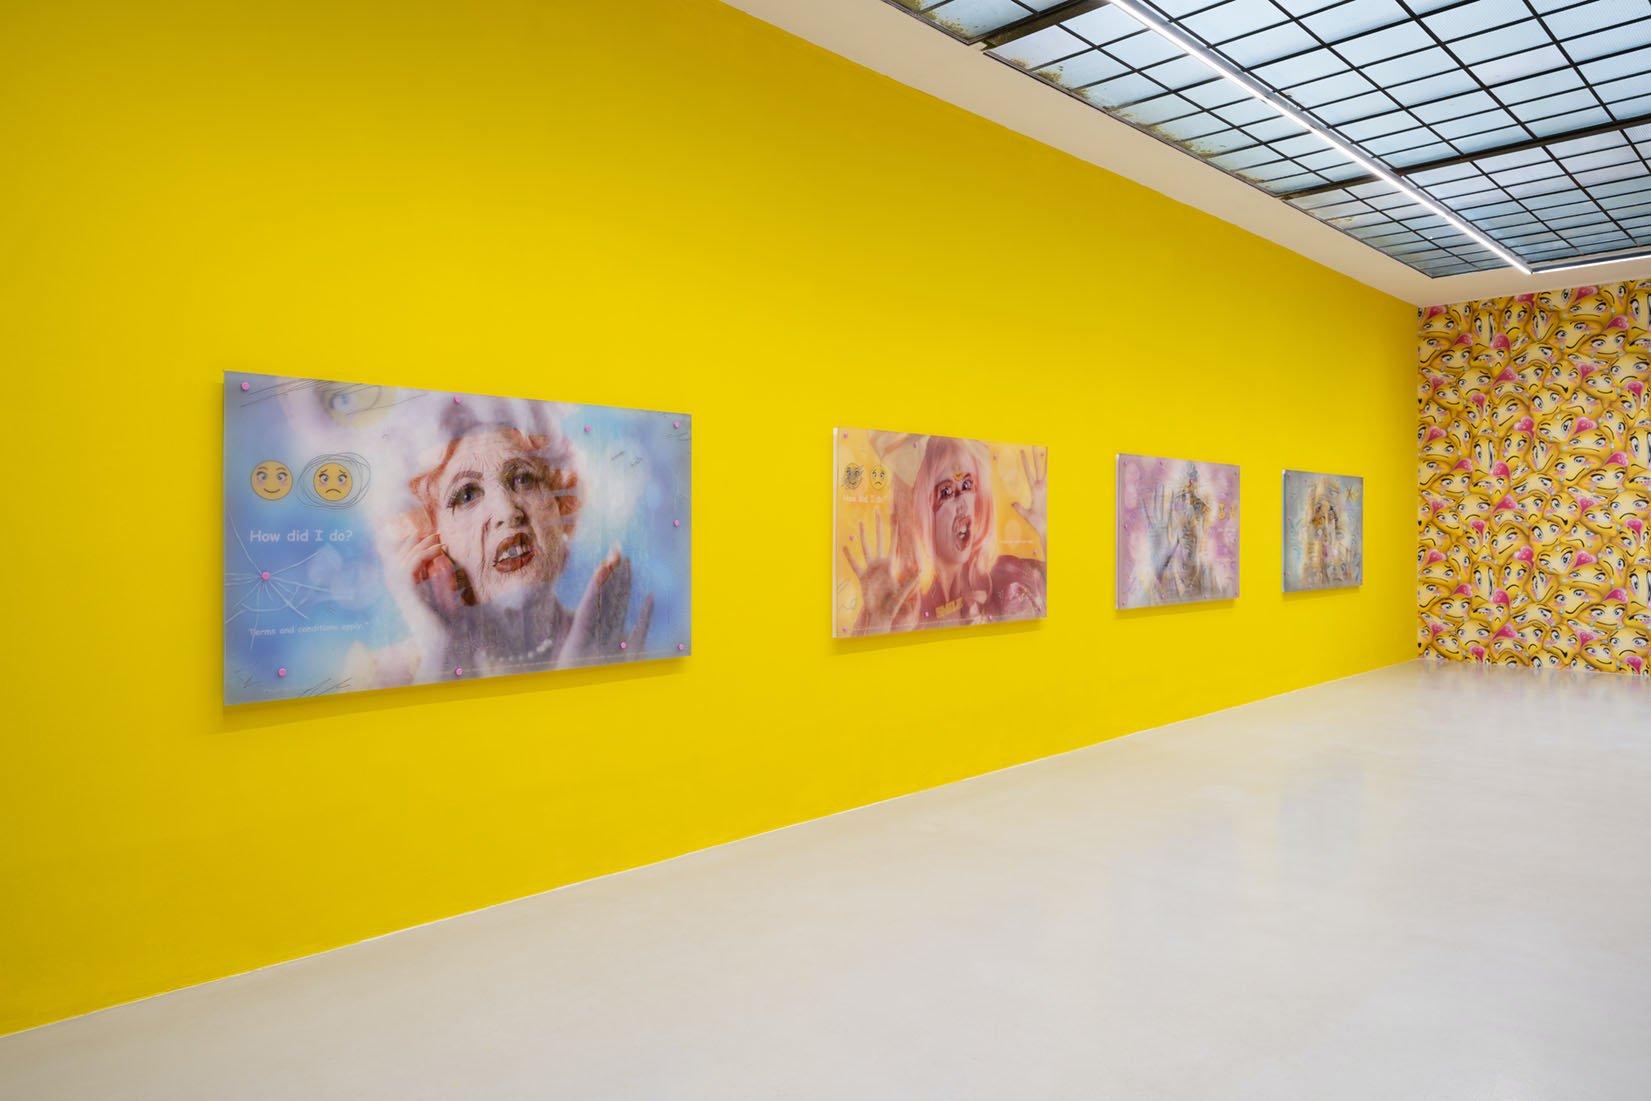 Galerie Kandlhofer Rachel Maclean new 1